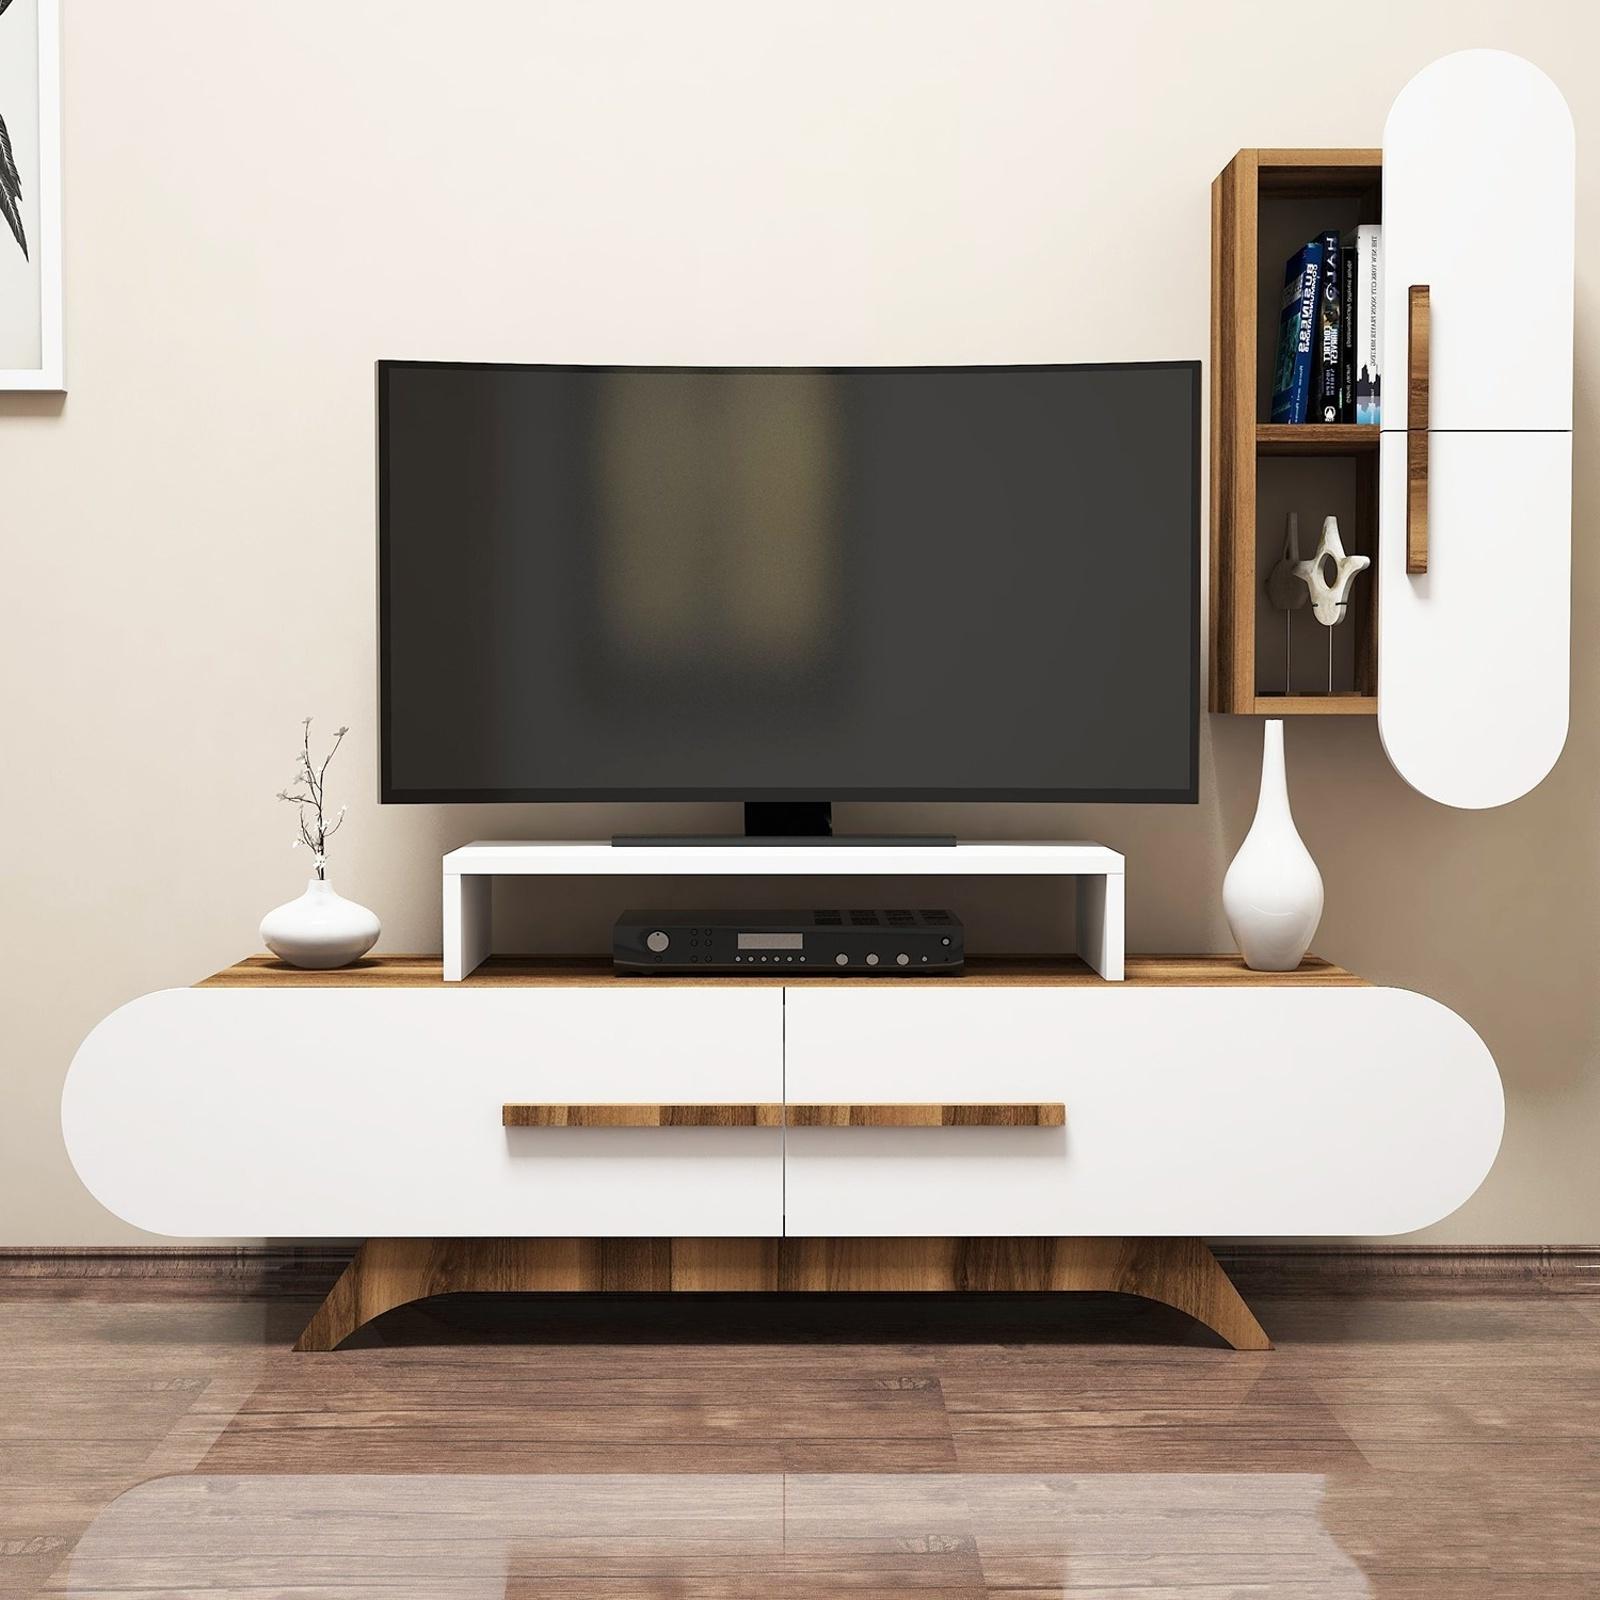 Variant Rose Duvar Raflı Tv Sehpası Ceviz Beyaz   Yukko Intended For Ducar 74 Inch Tv Stands (View 7 of 20)